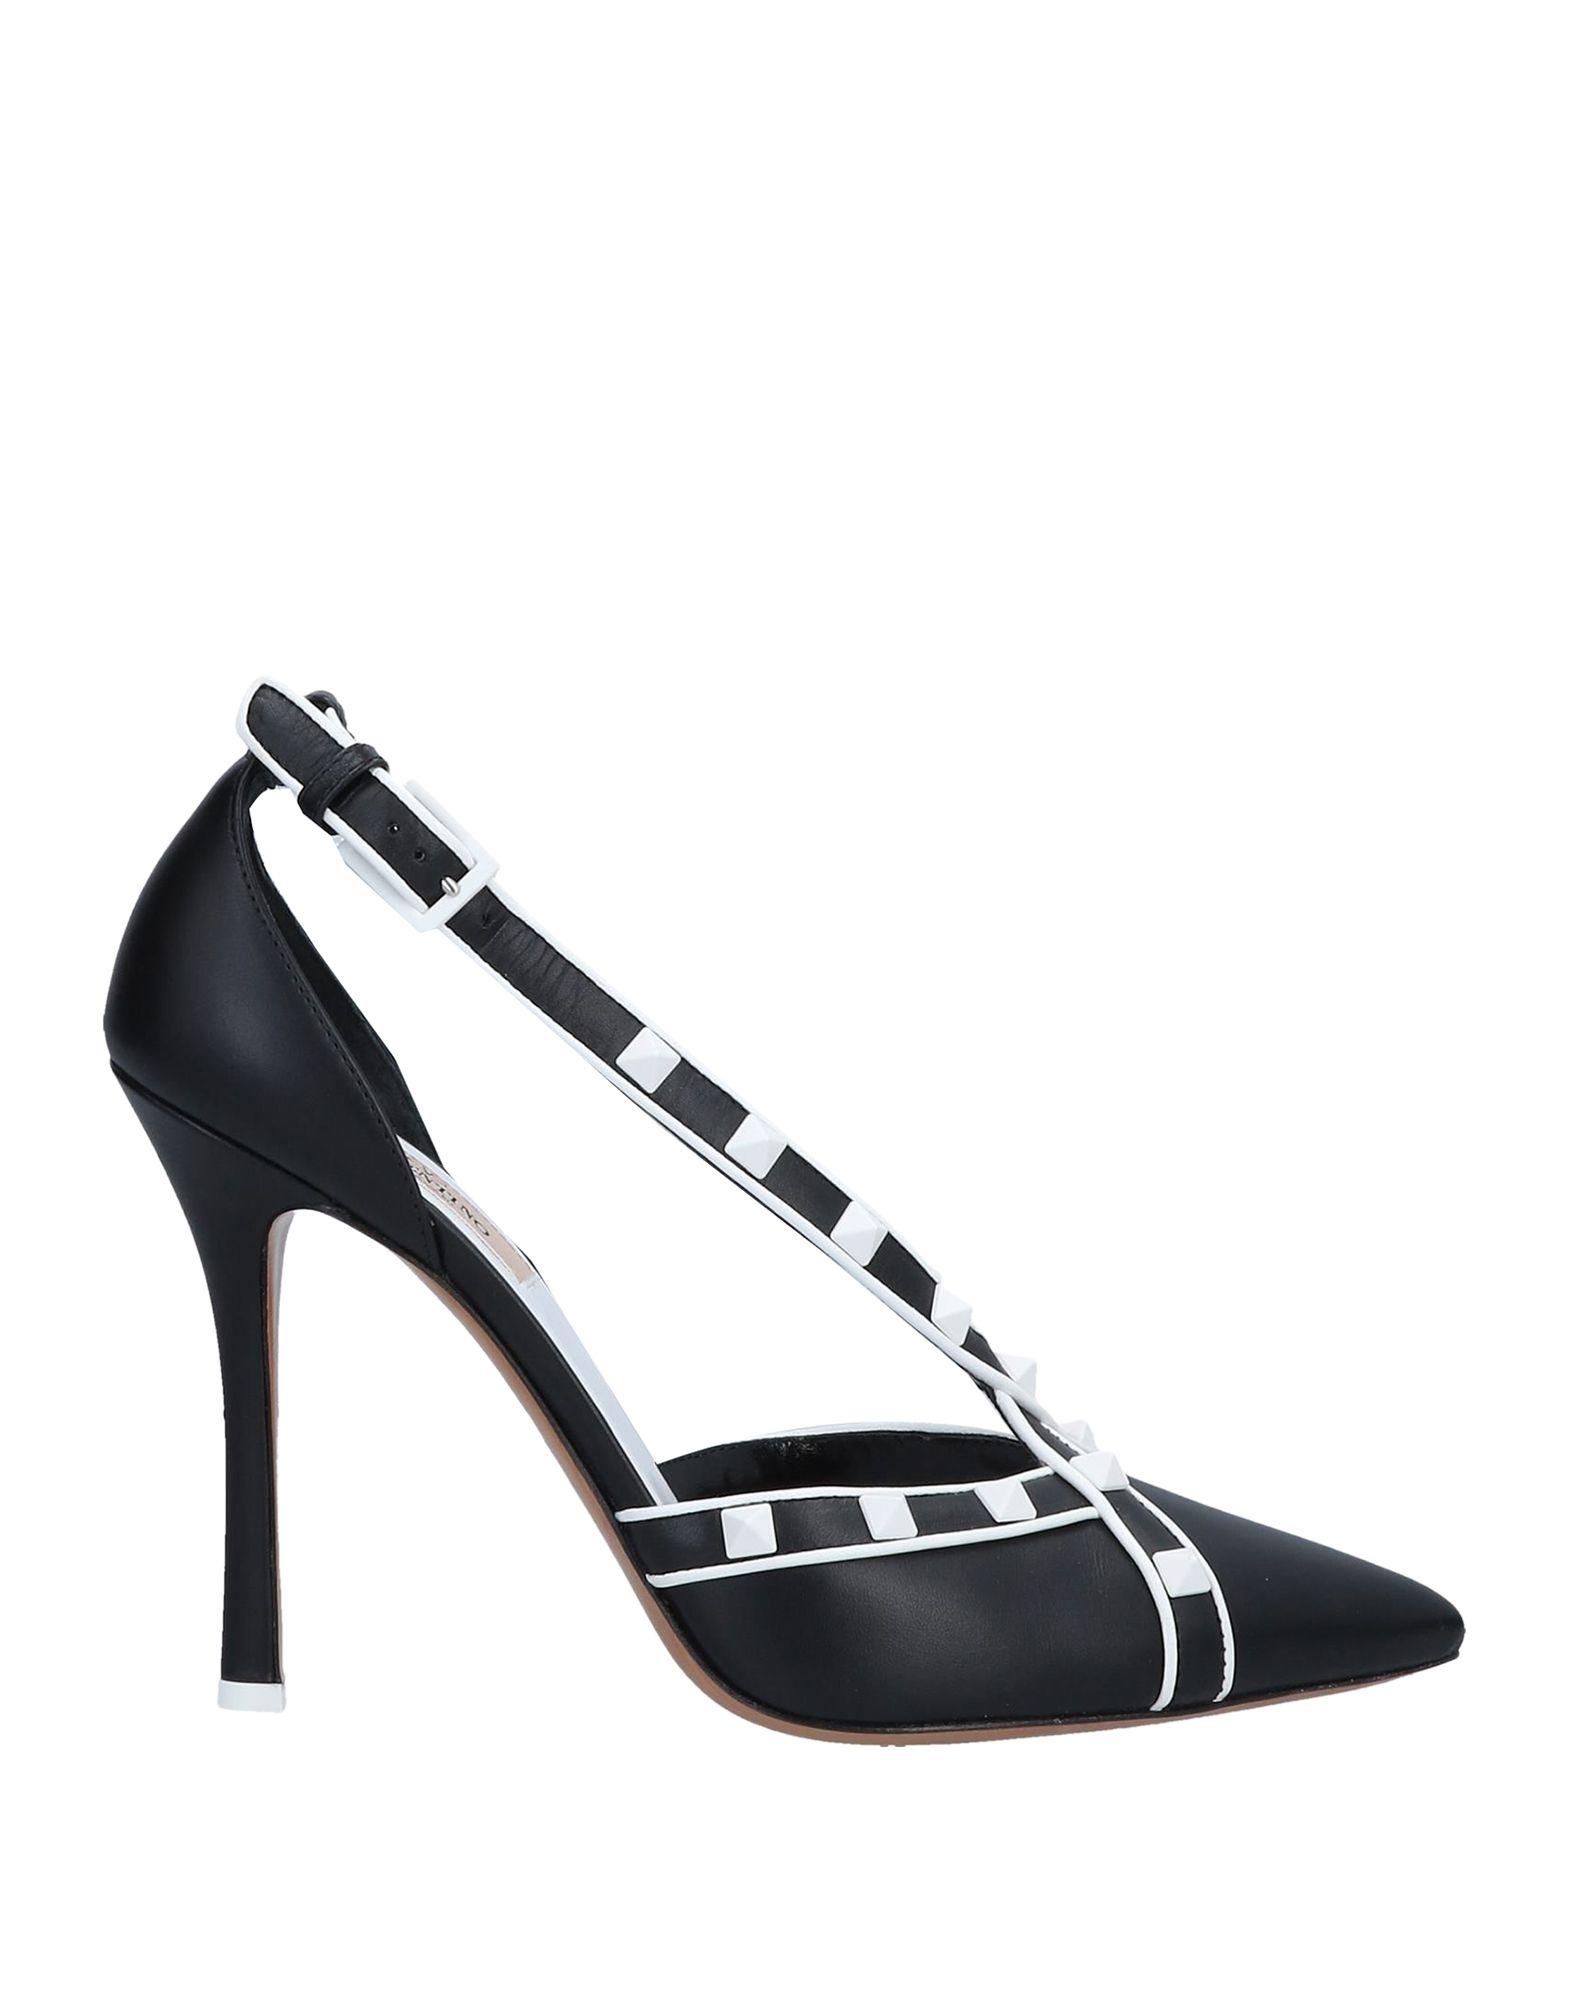 Negro Zapato De Salón Valtino Valtino Valtino Garavani Mujer - Salones Valtino Garavani Casual salvaje db53c6